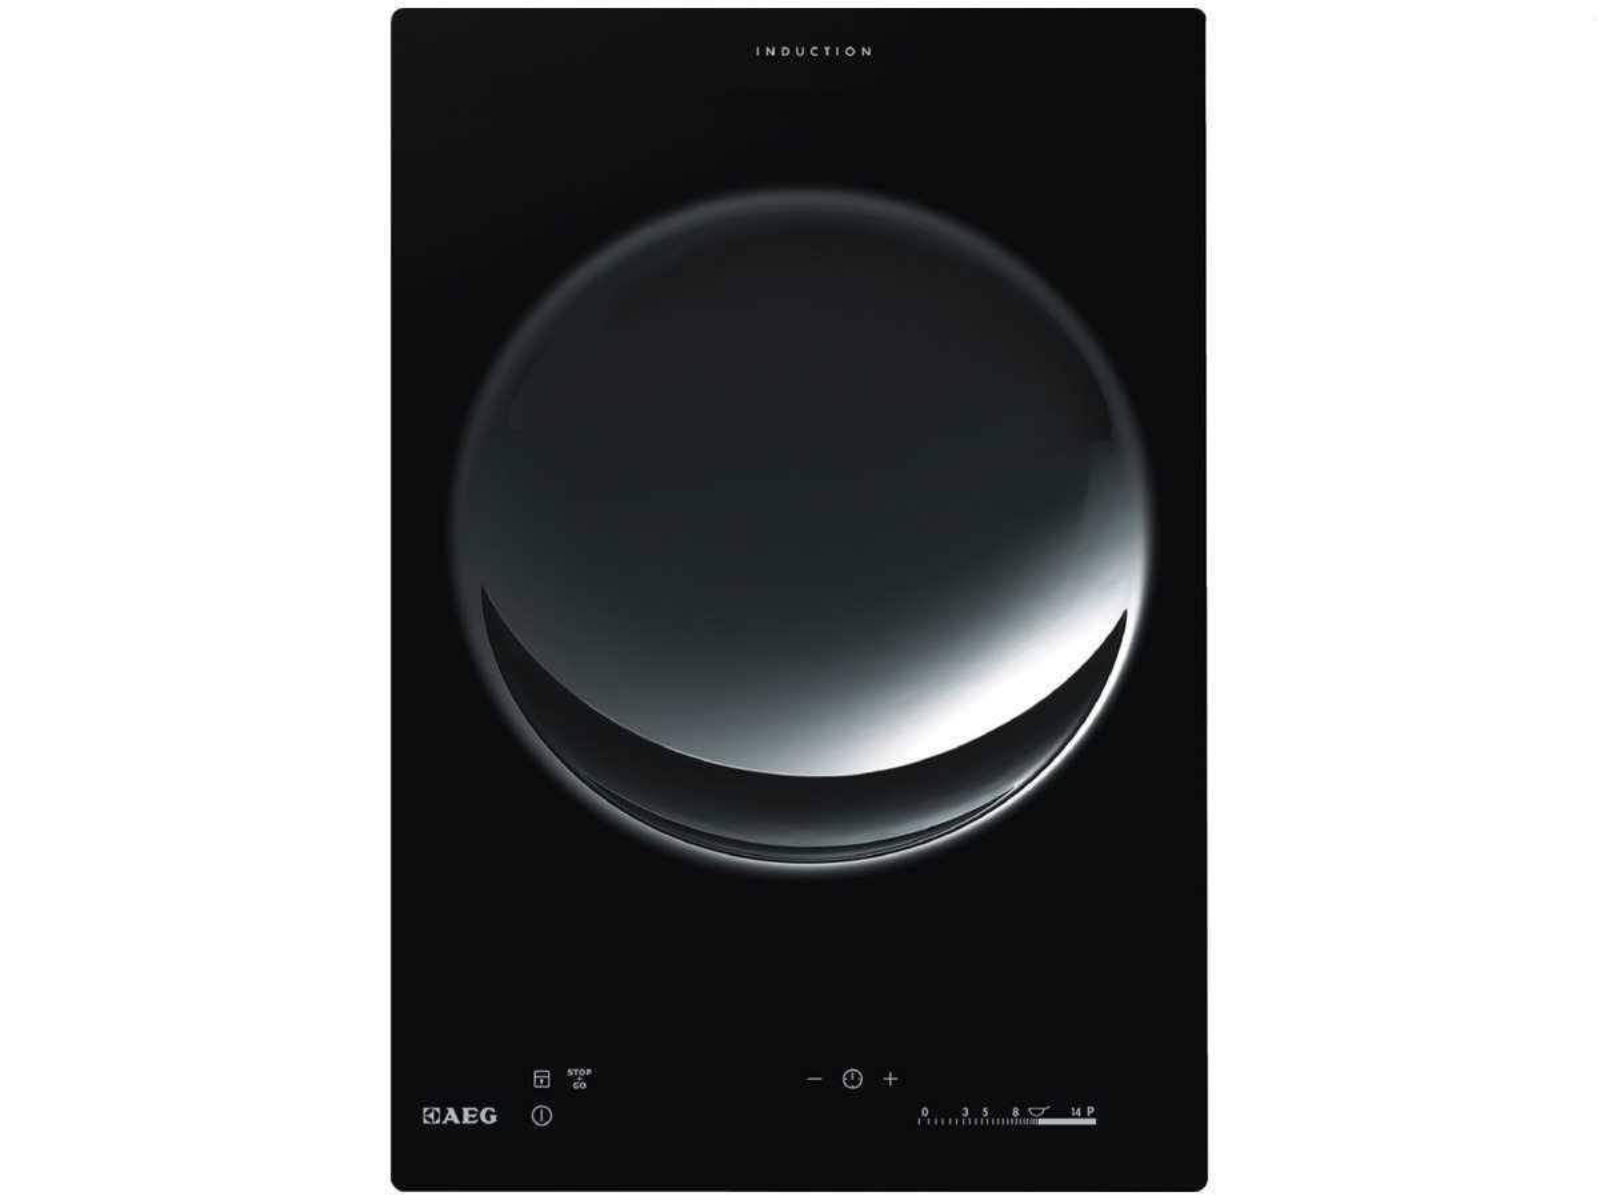 aeg hc451501eb domino induktionskochfeld autark. Black Bedroom Furniture Sets. Home Design Ideas